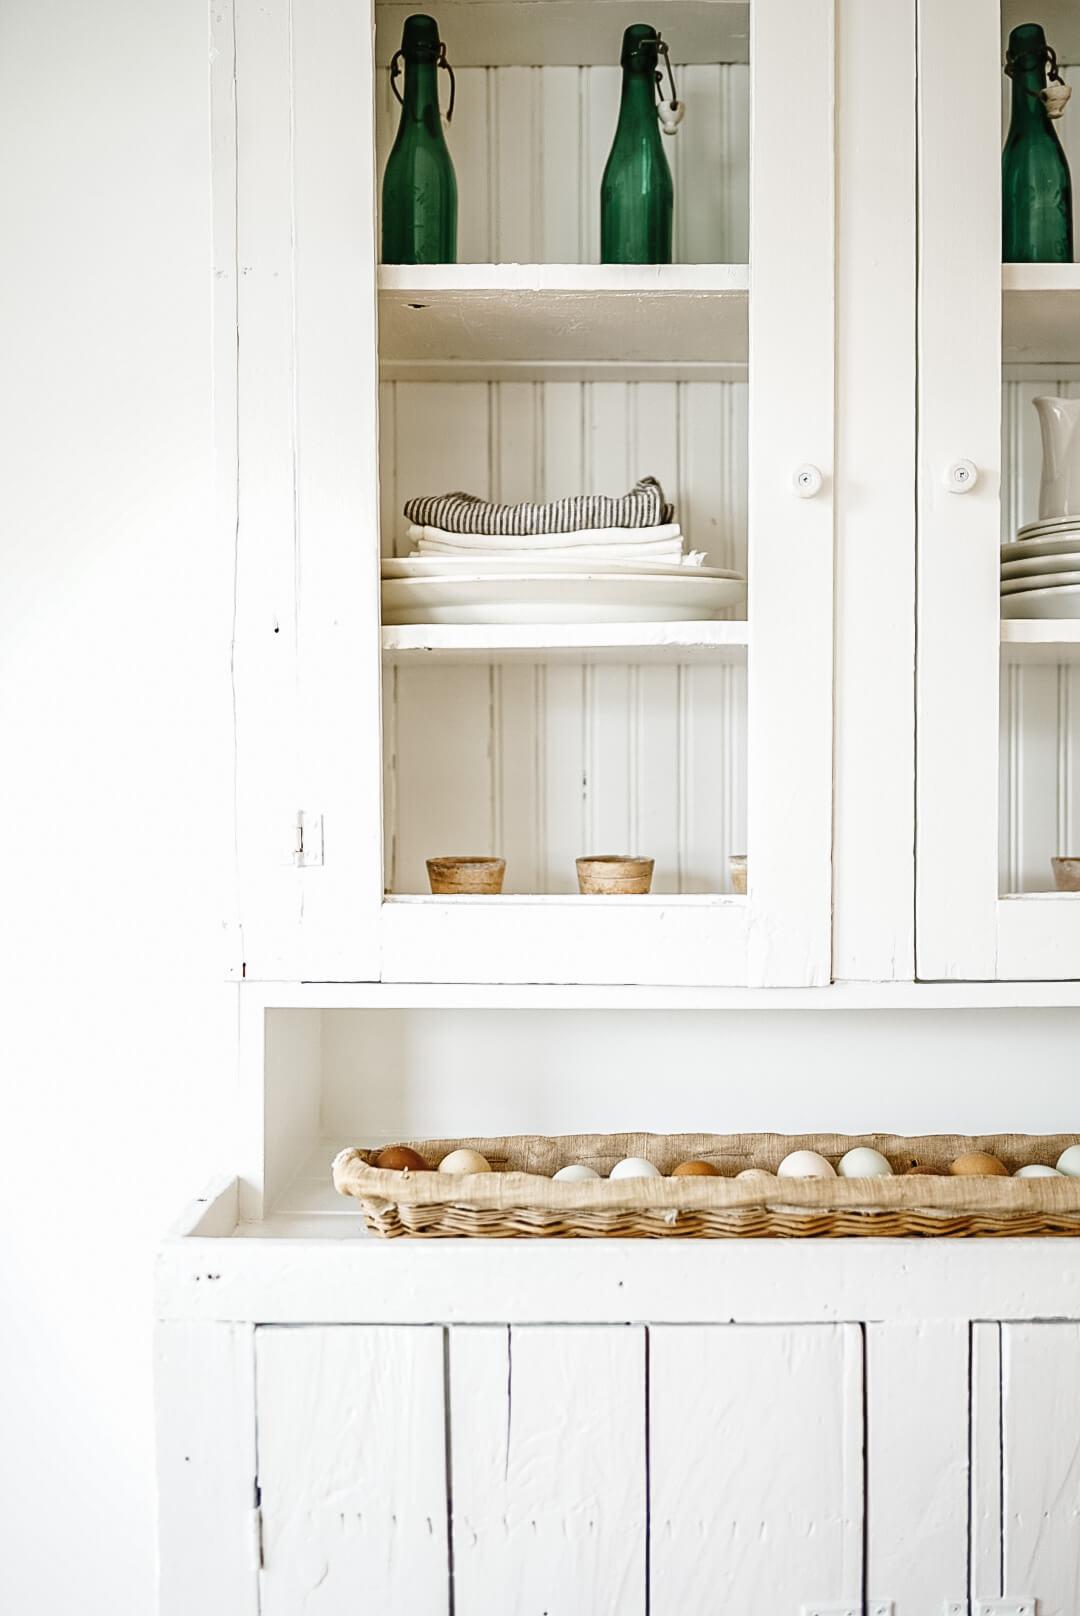 Details of White Hutch farm fresh eggs linen towels dinning decor